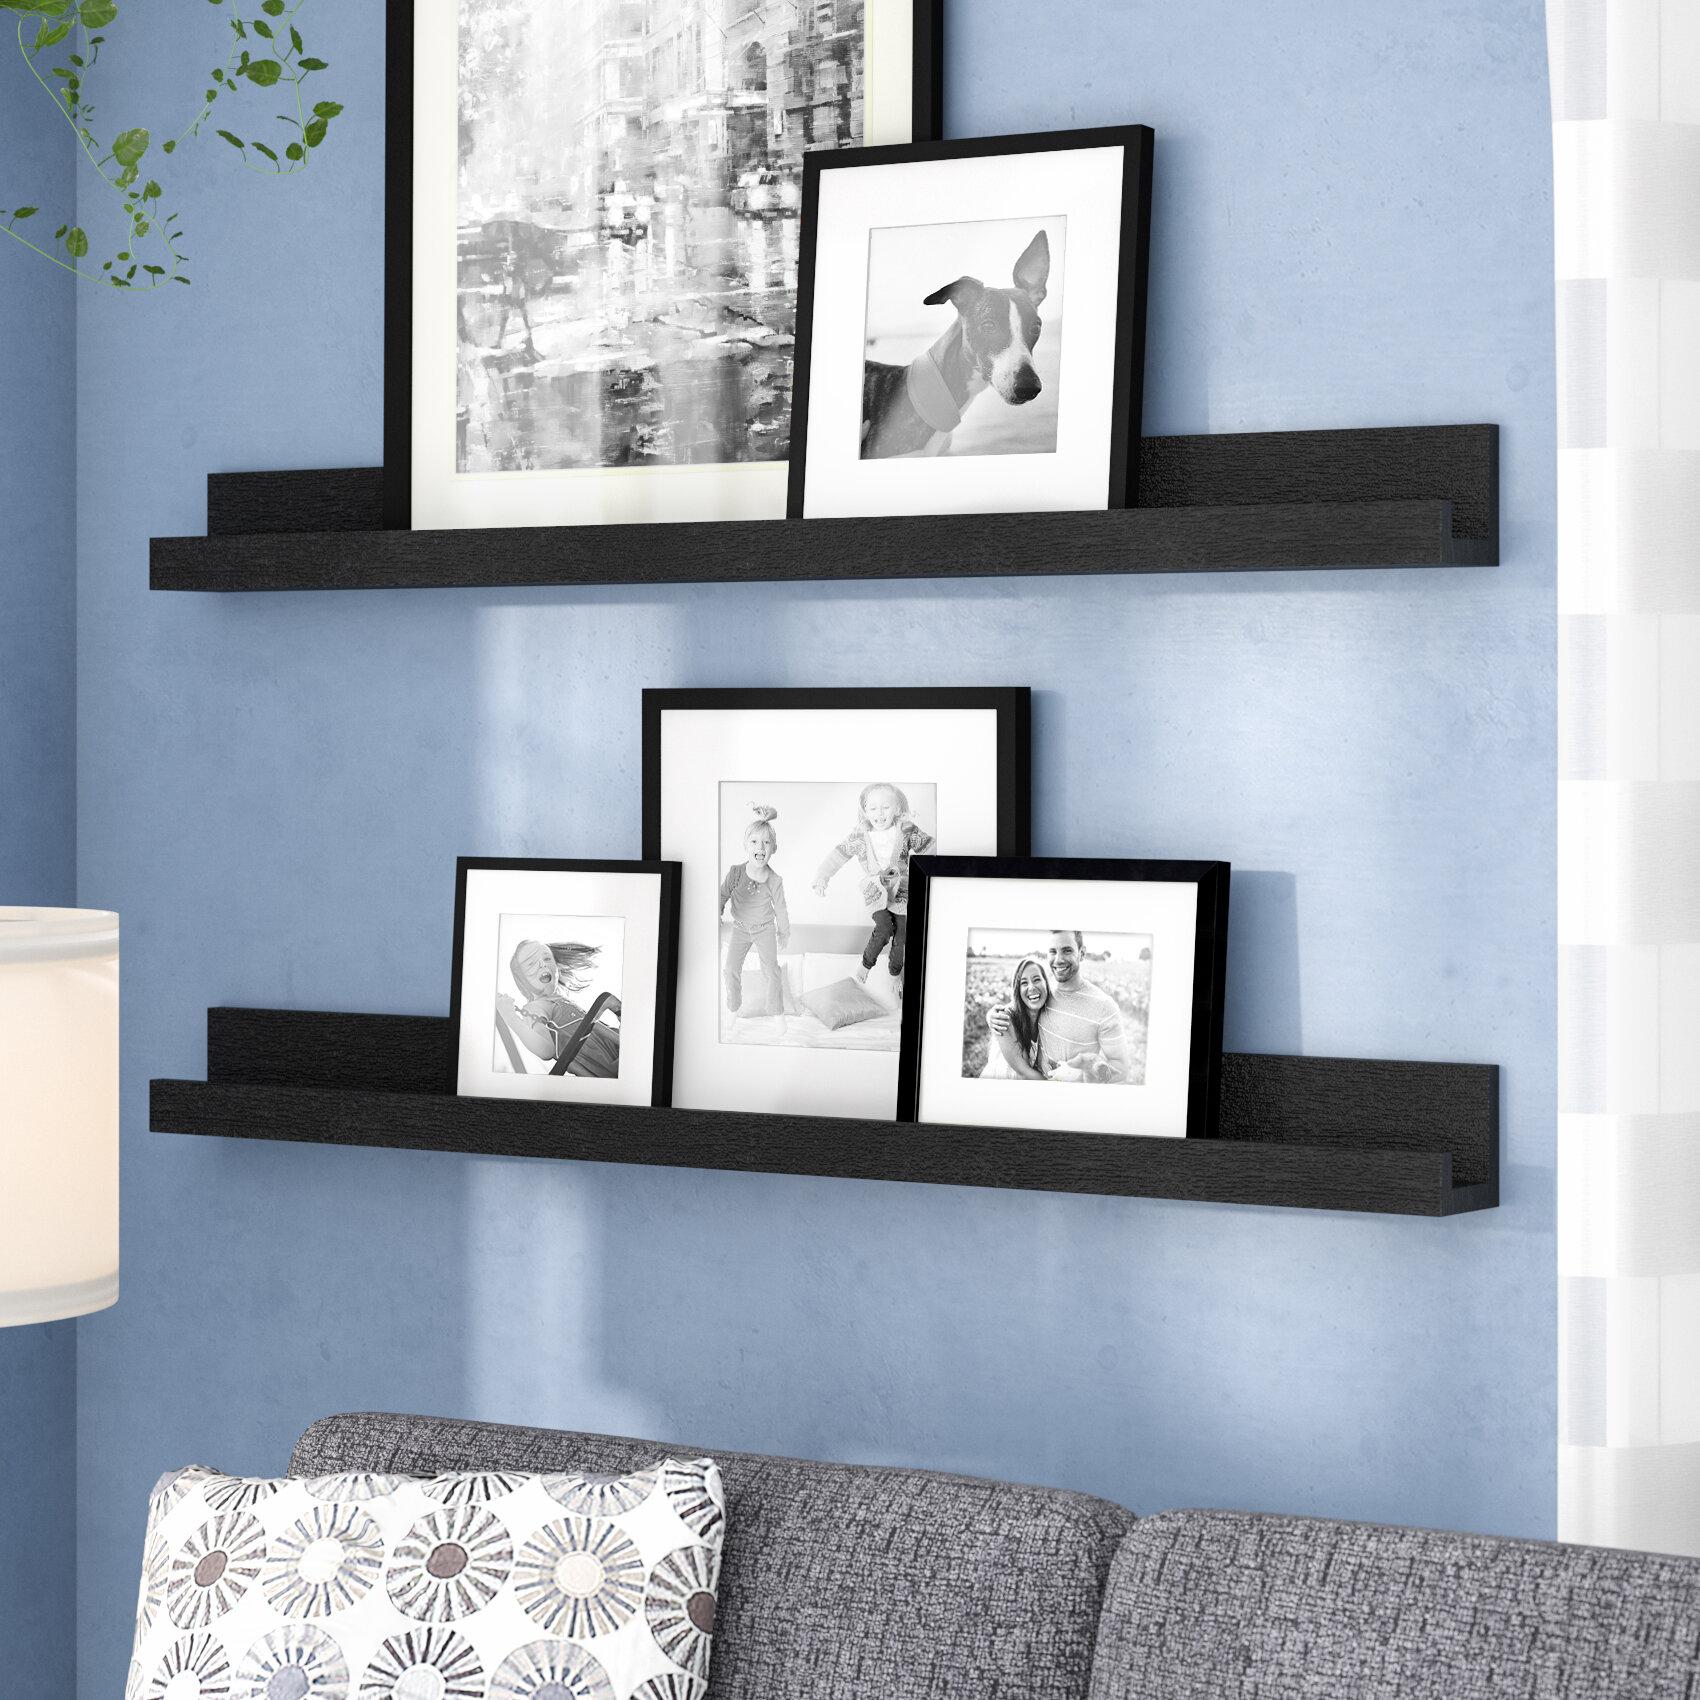 Red Barrel Studio Dulin 2 Piece Floating Shelf Reviews Wayfair Ca